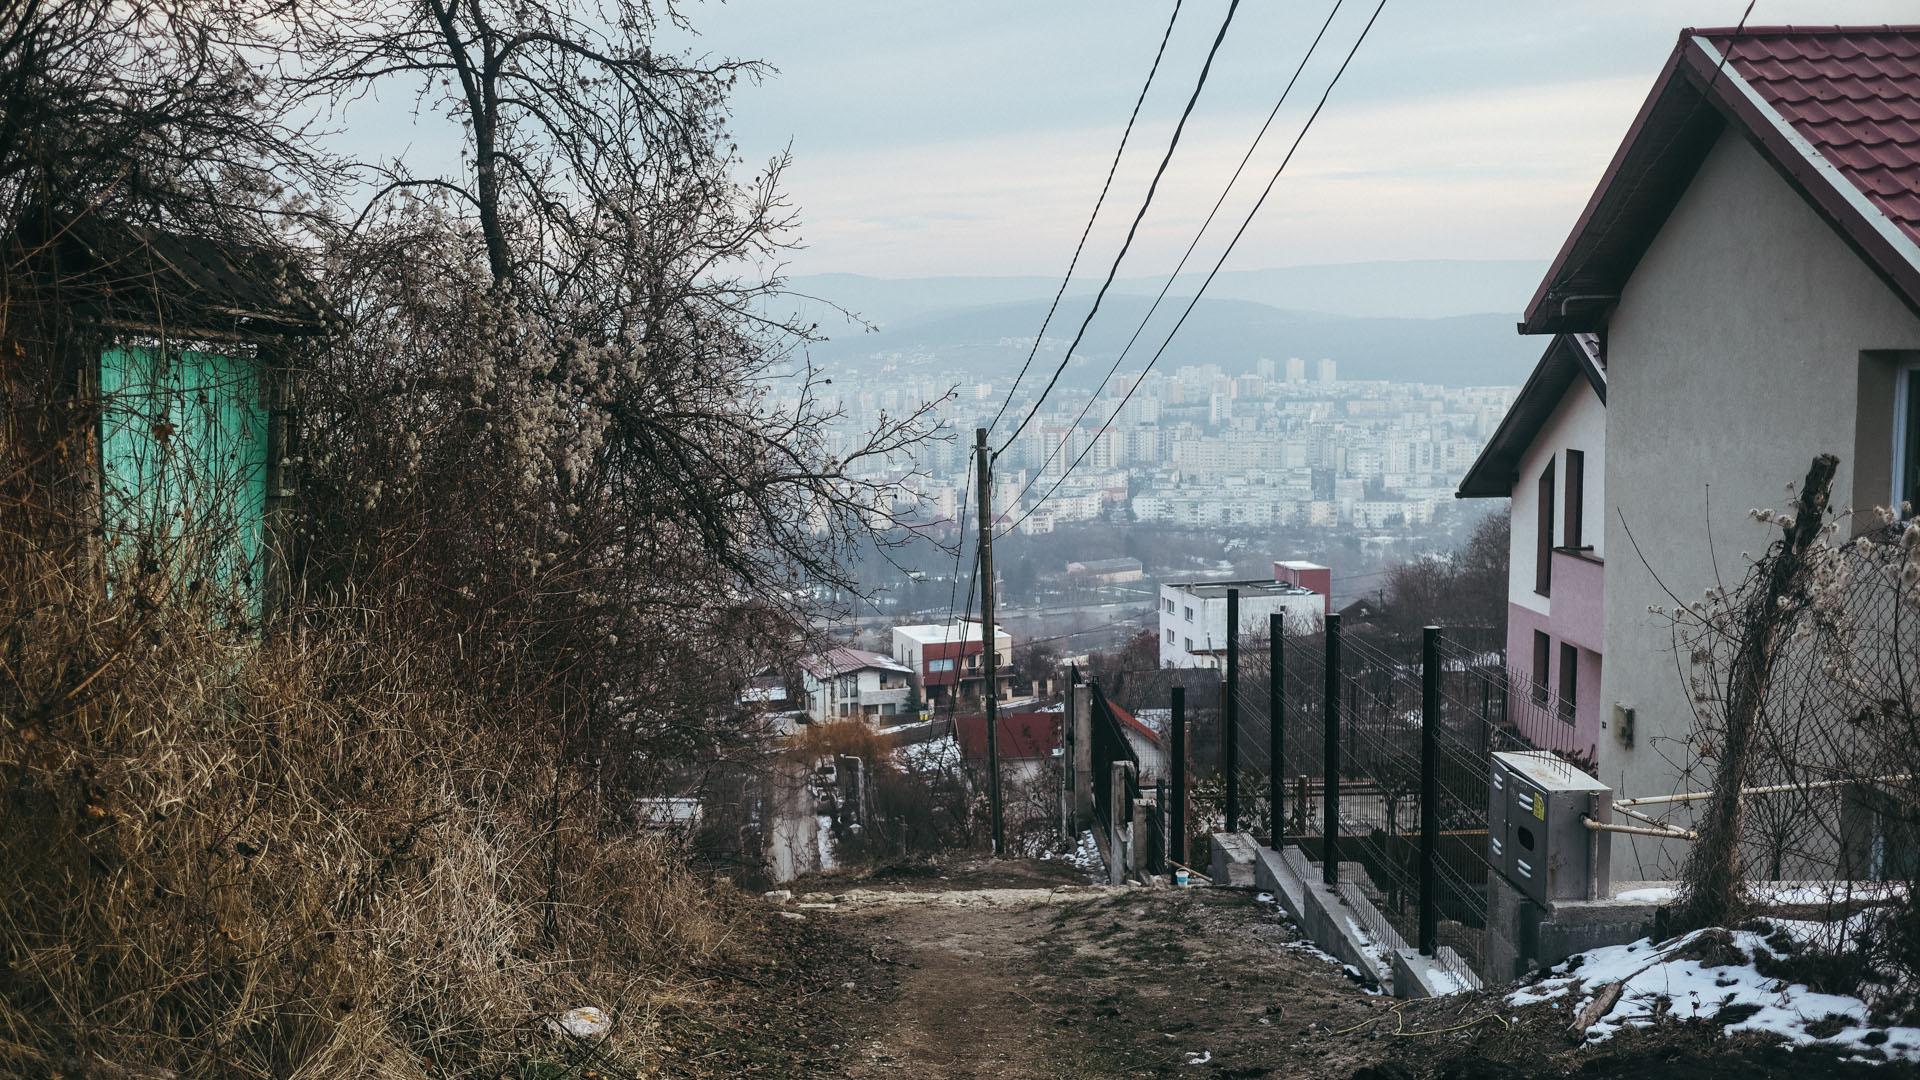 Point de vue Cluj-Napoca